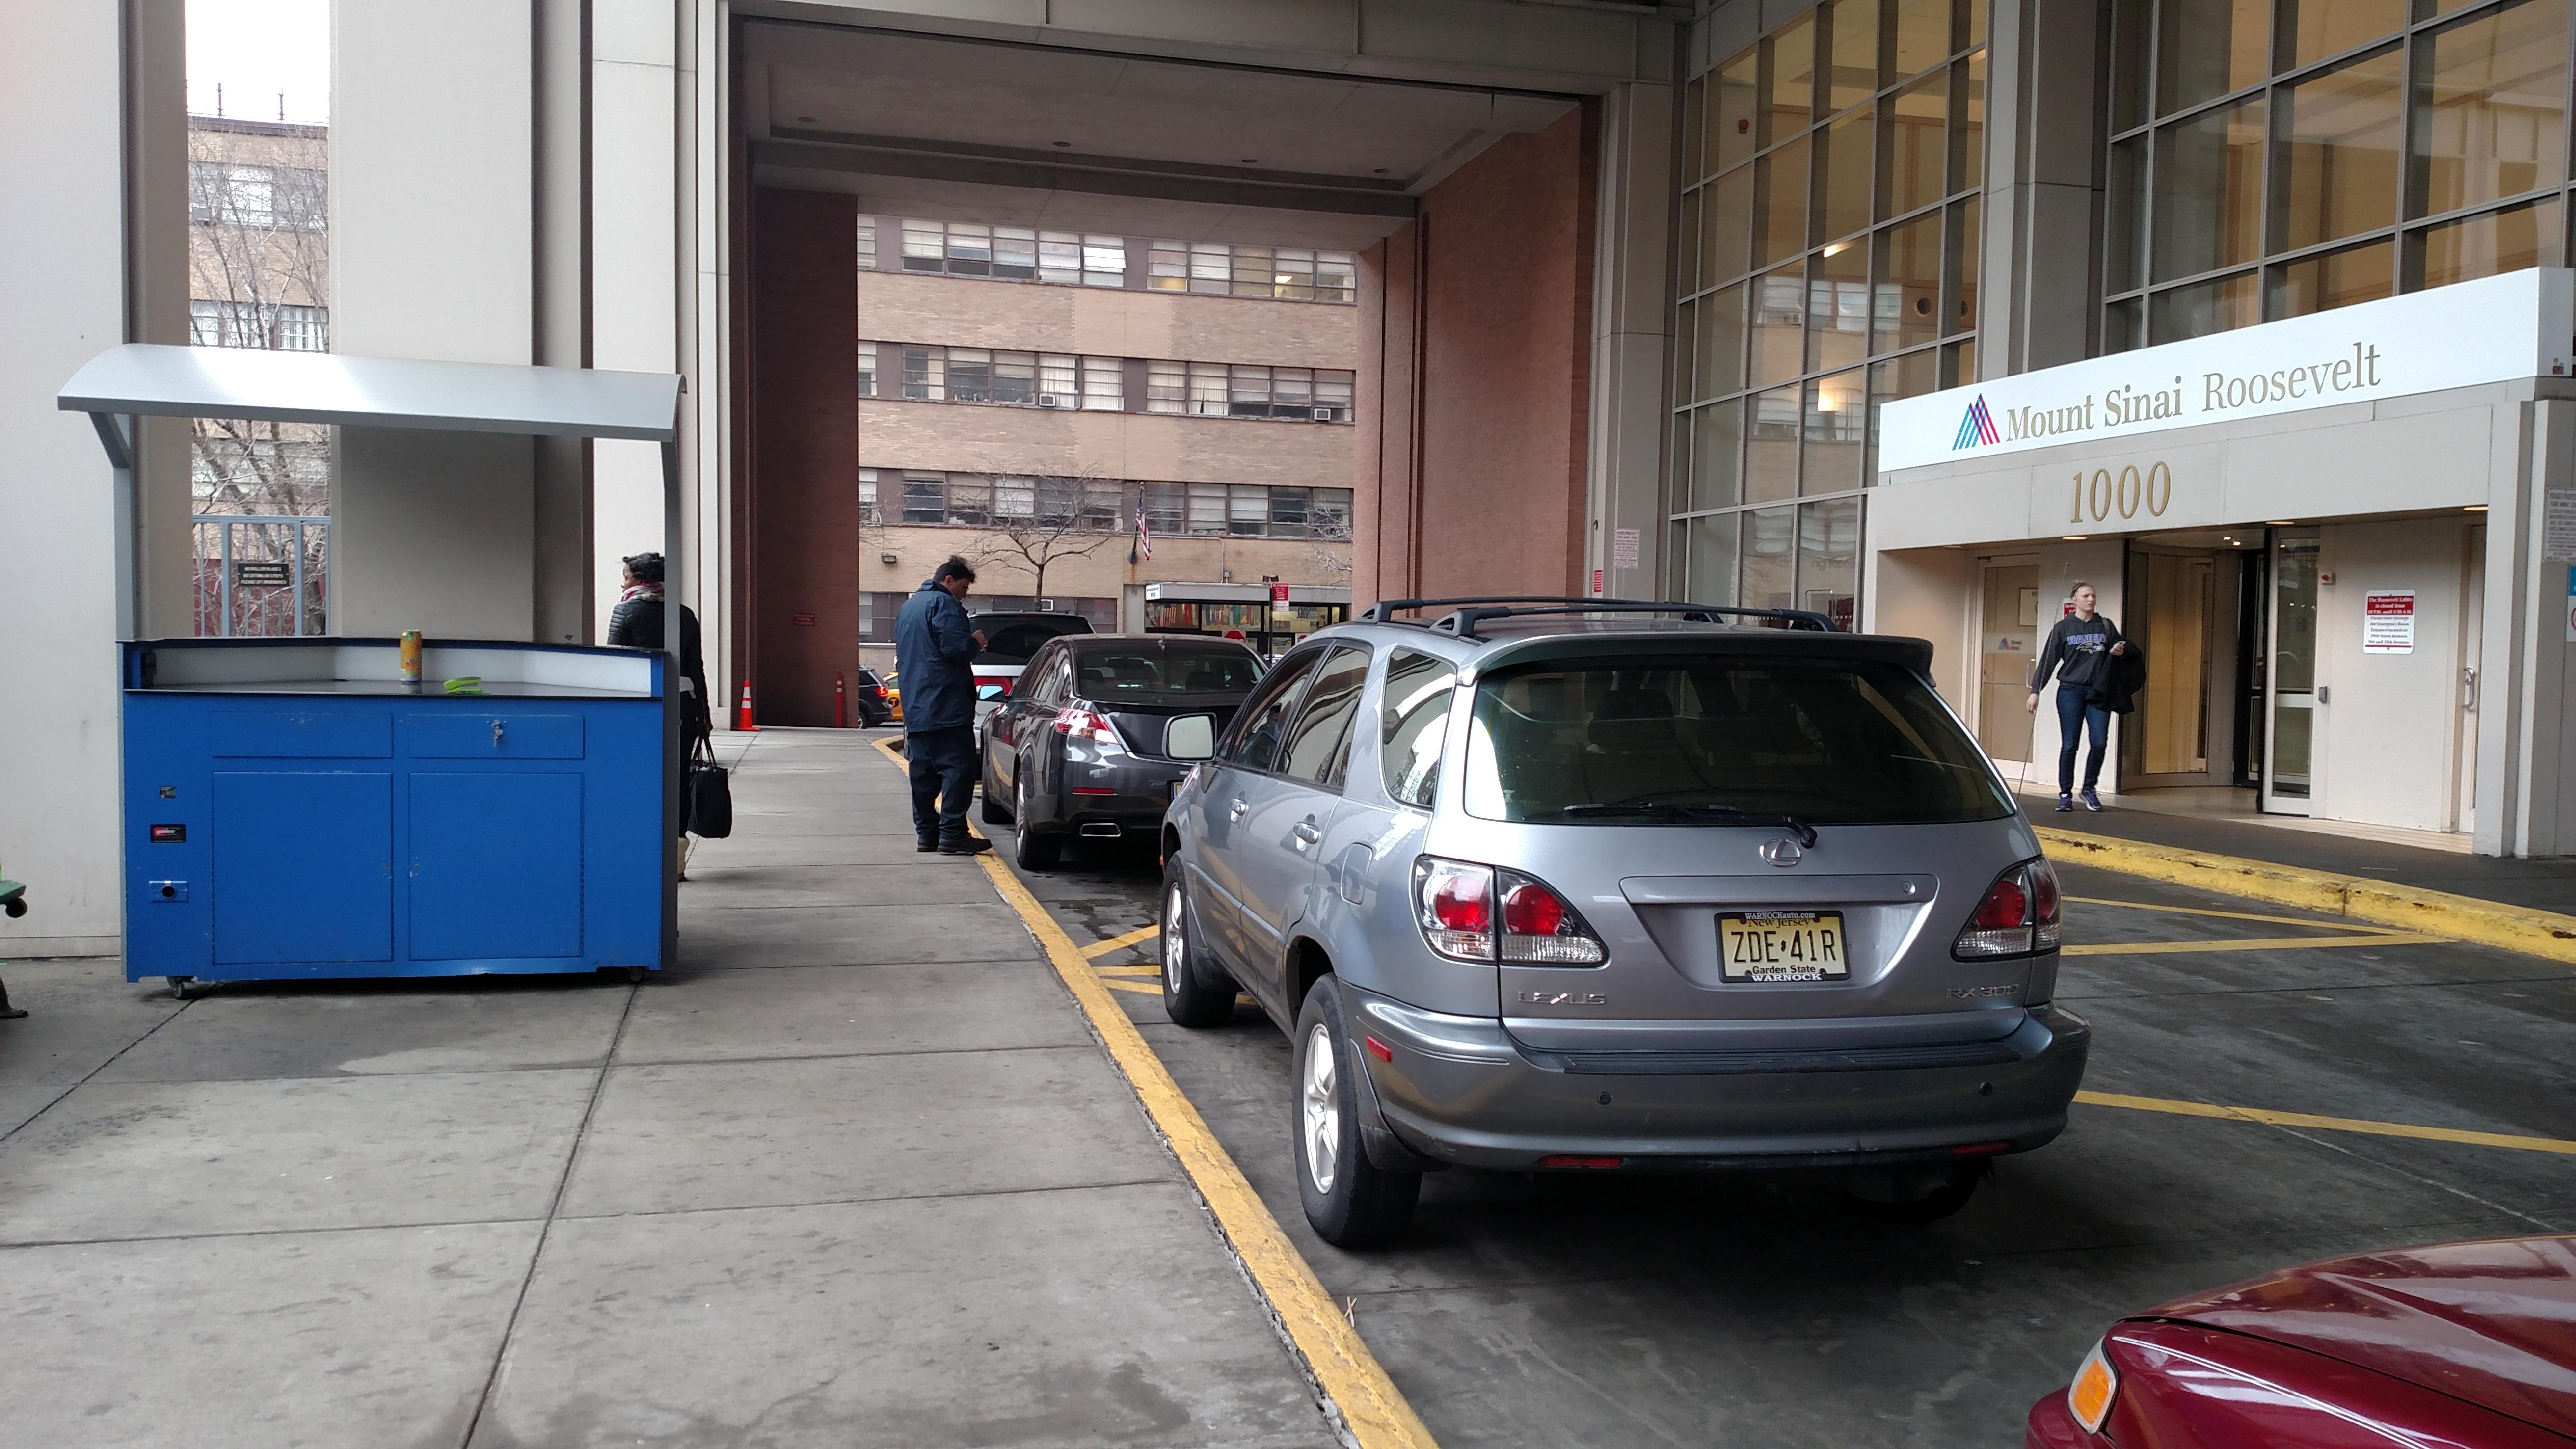 Mount Sinai West - Parking in New York | ParkMe